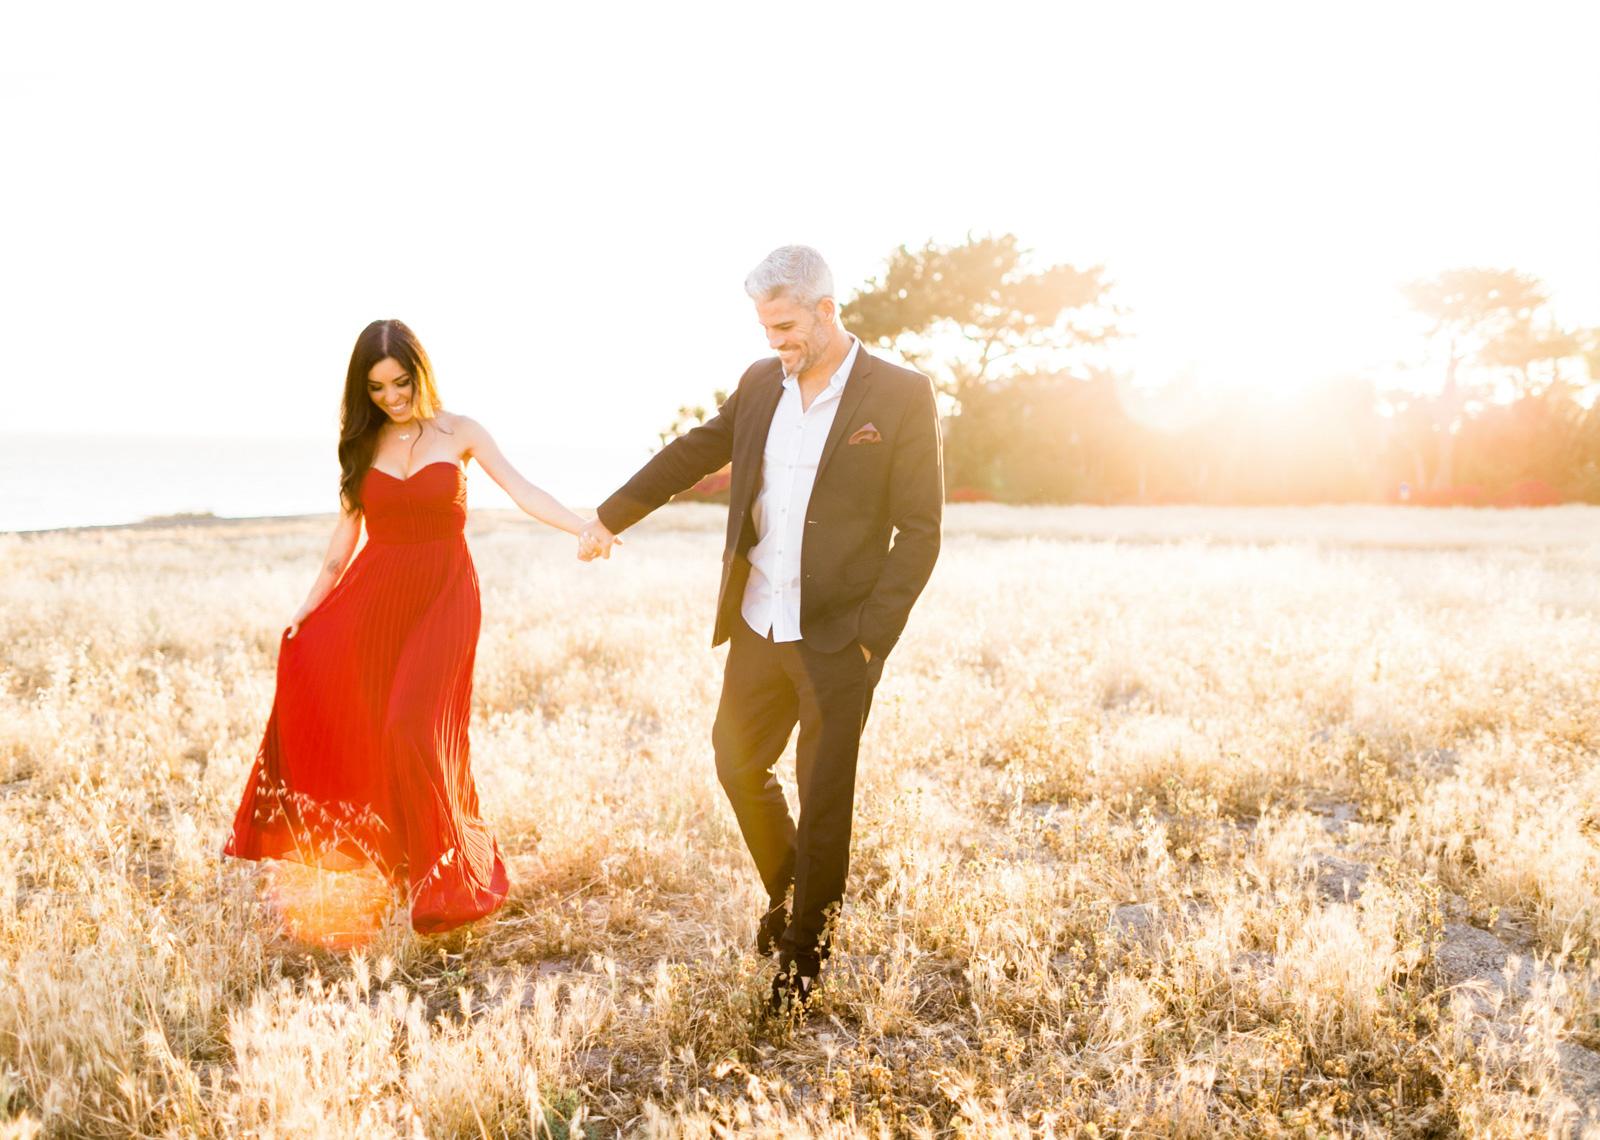 Santa-Barbara-Wedding-Photographer-Natalie-Schutt-Photography_10.jpg